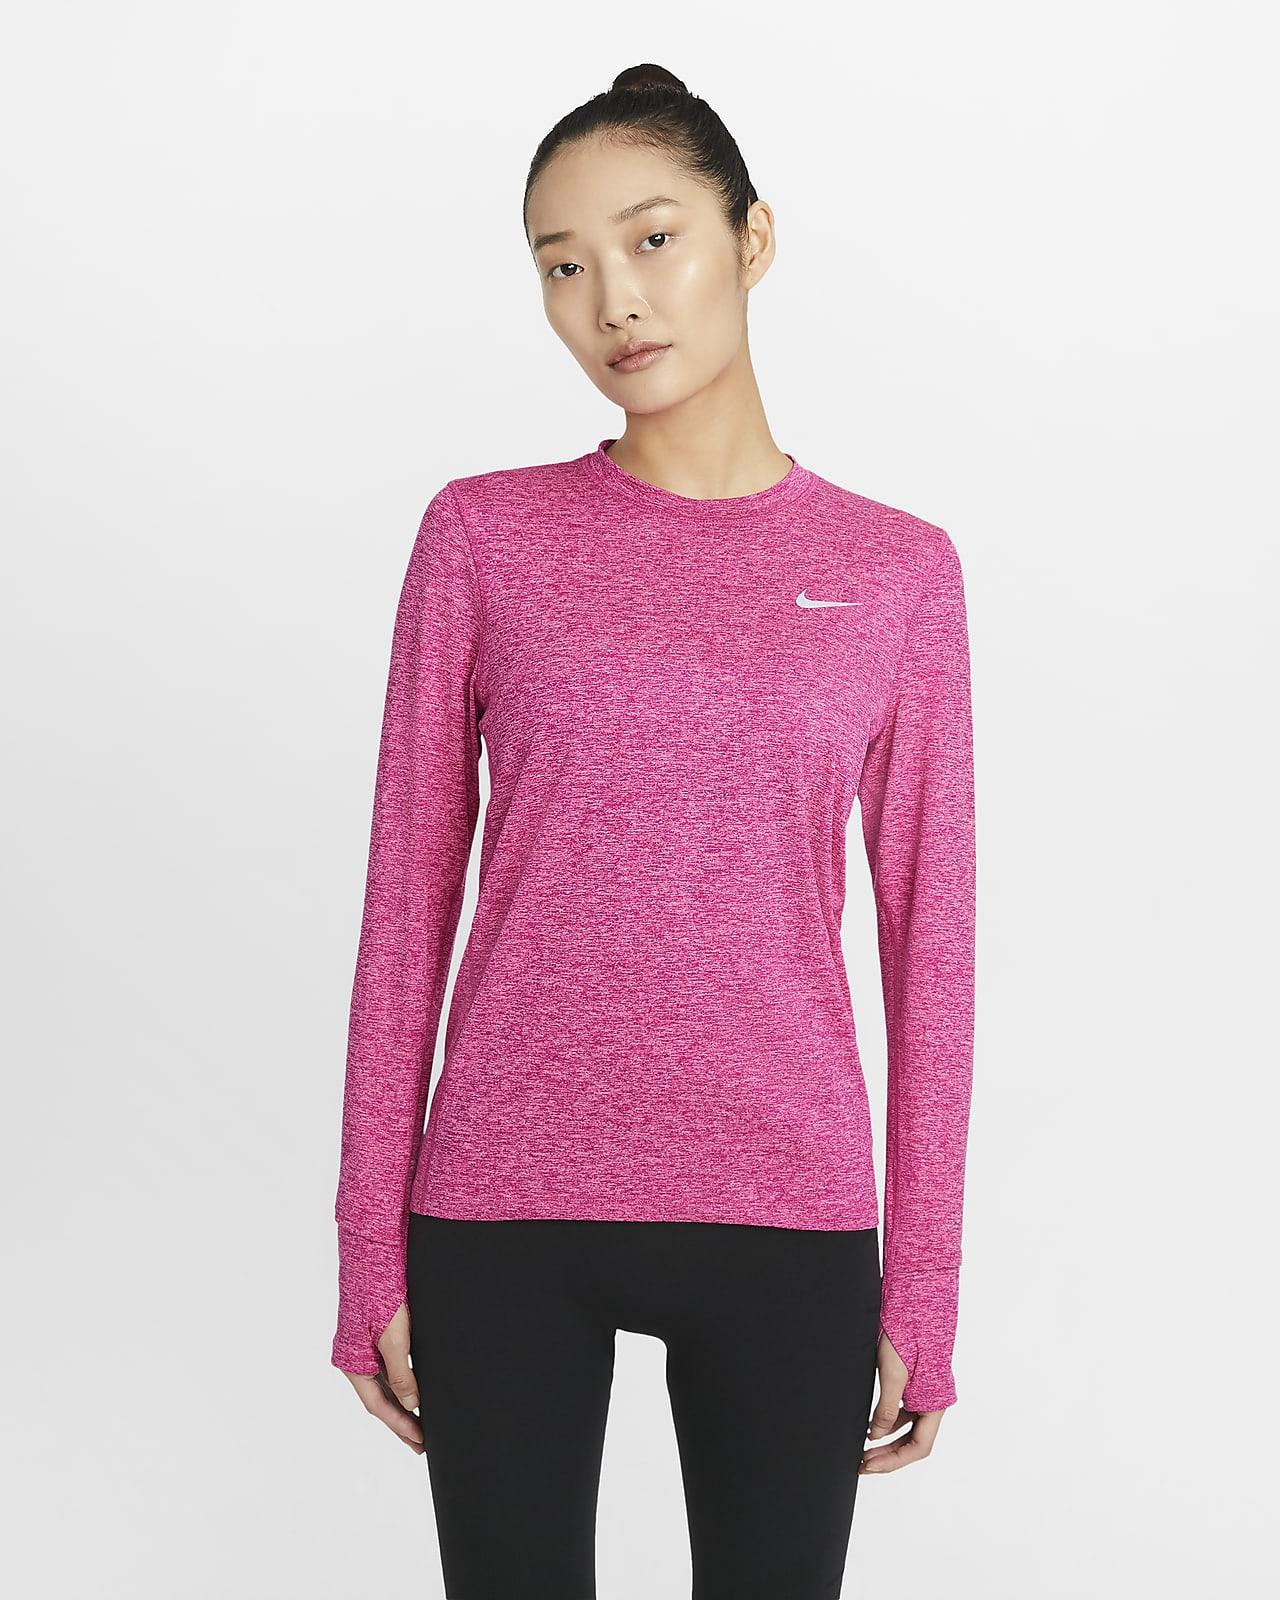 Camiseta de cuello redondo de running para mujer Nike Dri-FIT Element